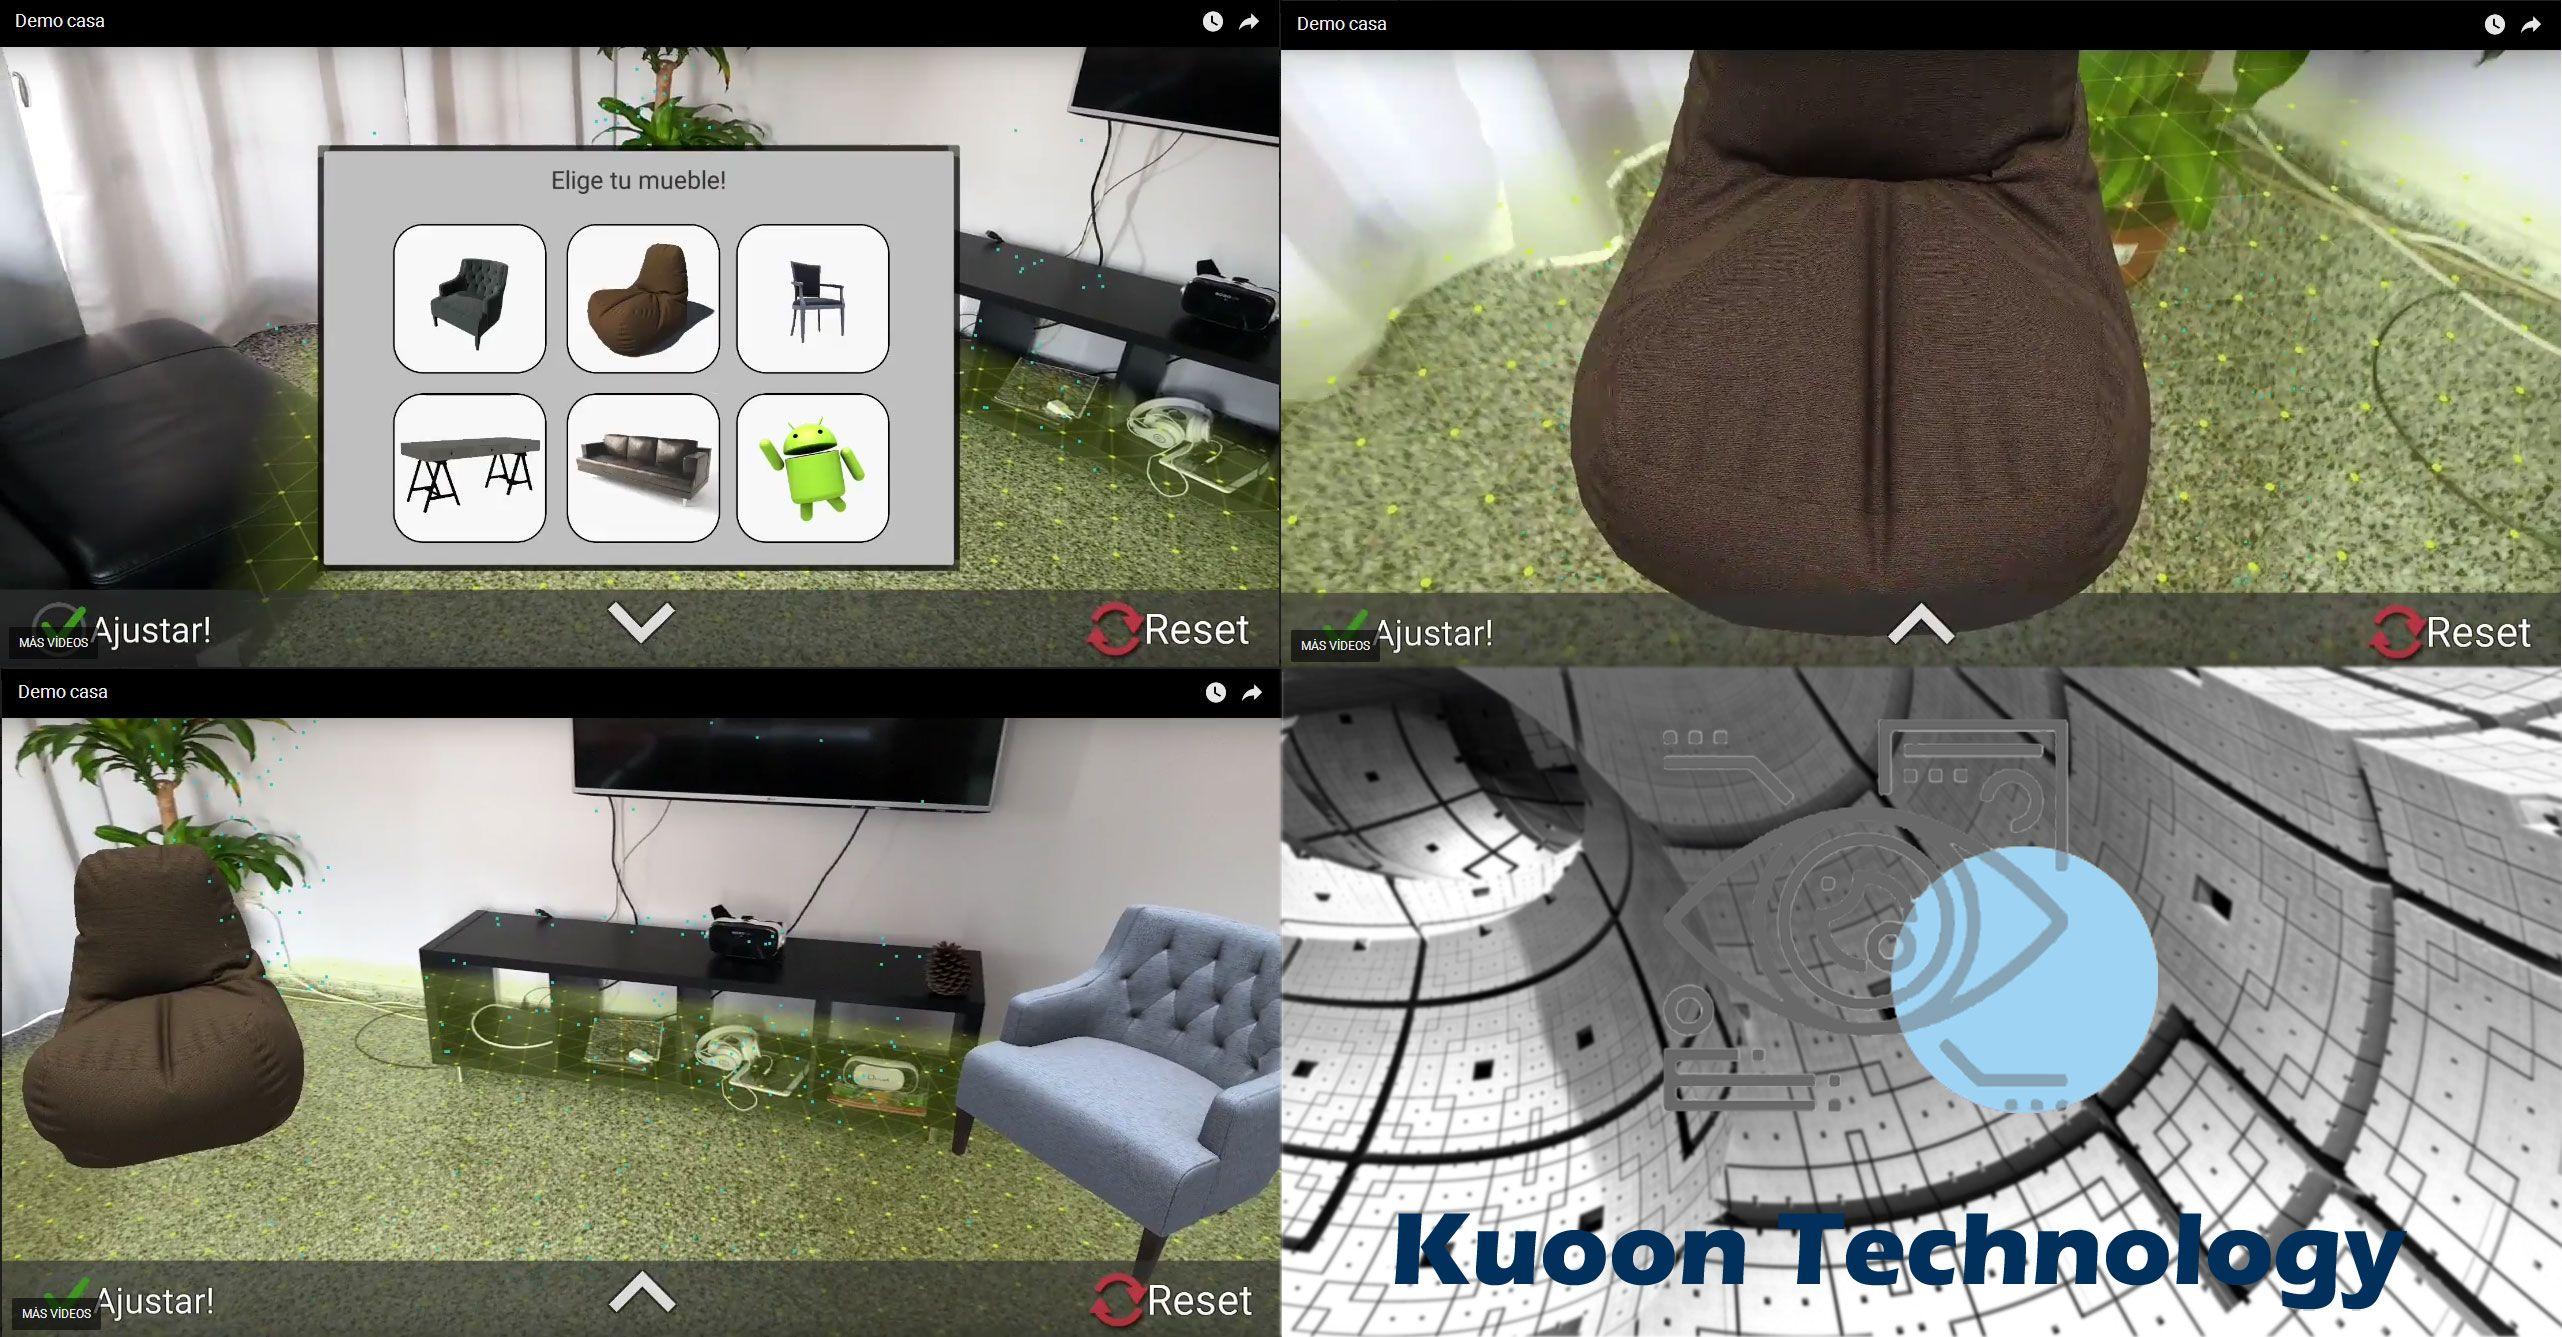 Fotografia Realidad-Aumentada-Kuoon-Technology-Google-ARCore